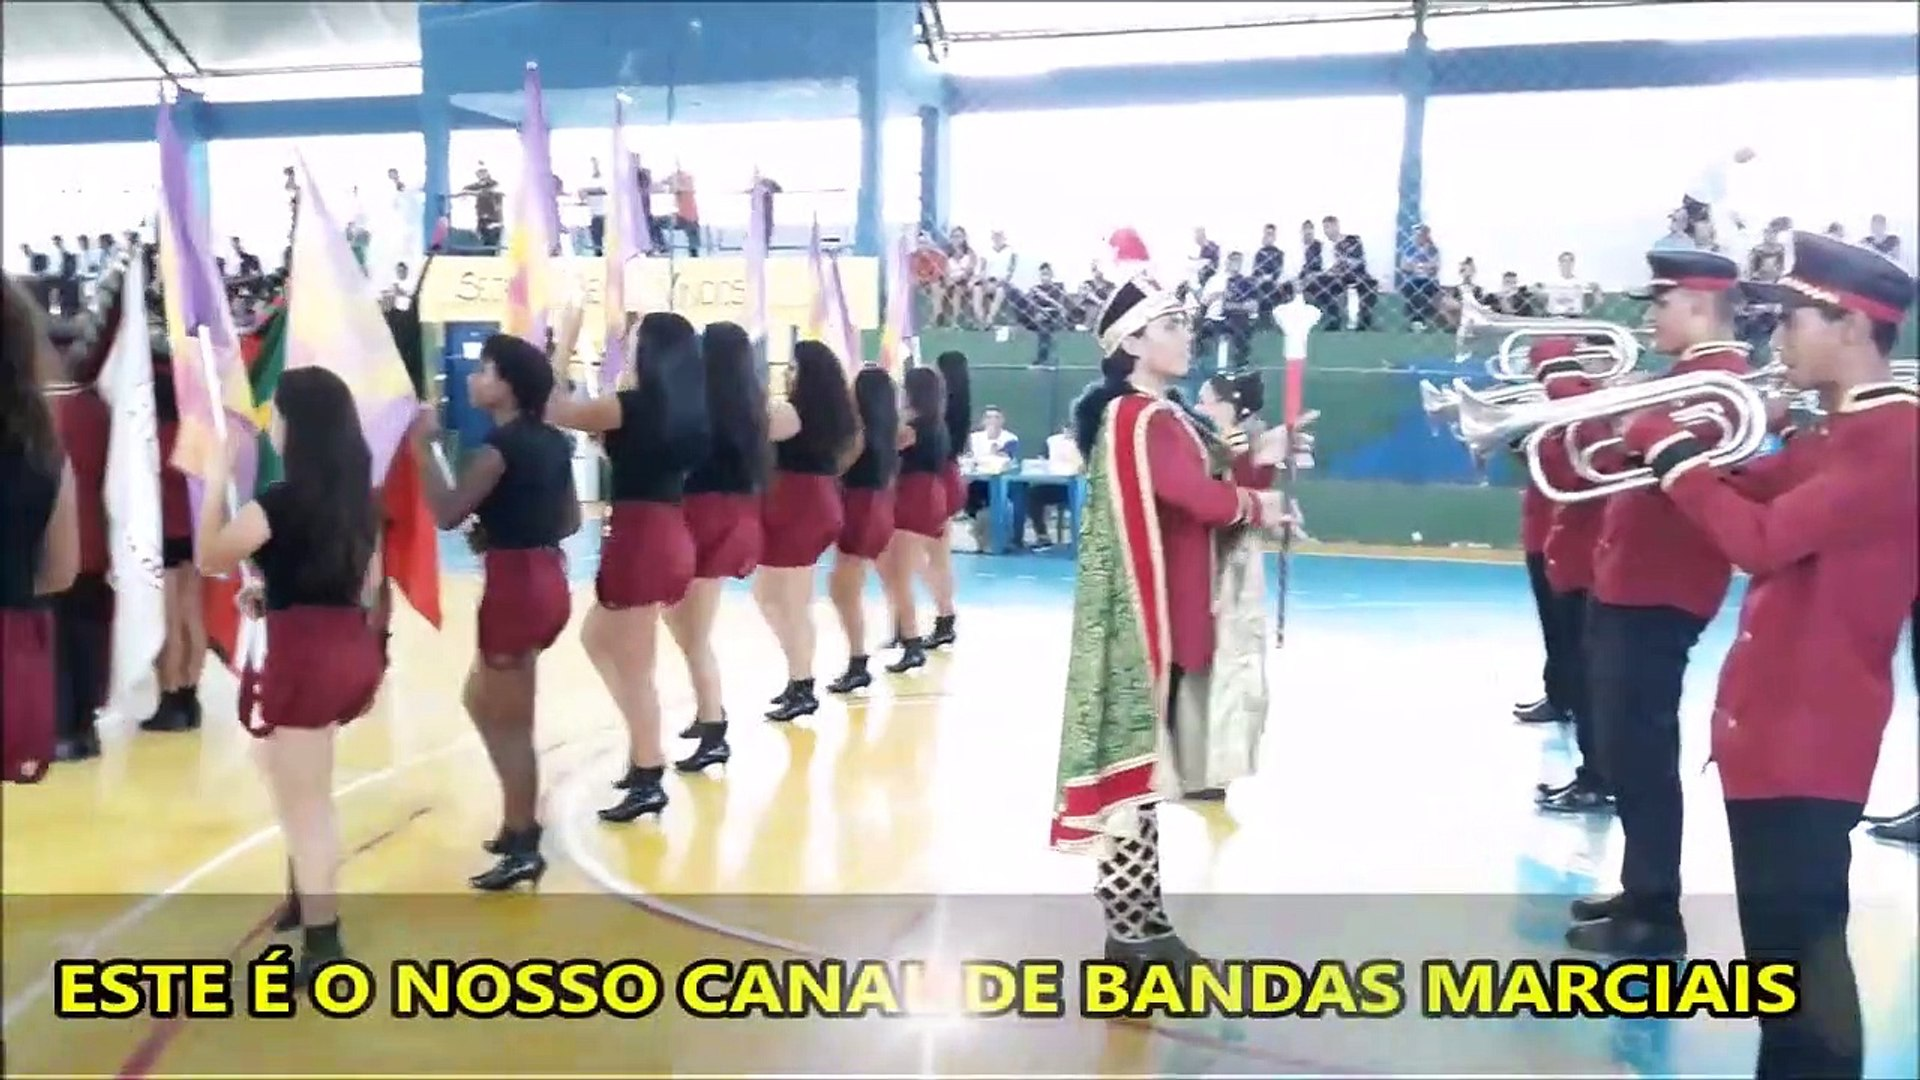 Fanfarra Com Válvula Municipal Professora Violeta Costa De Souza 2018 - VI COPA NACIONAL DE BANDAS E